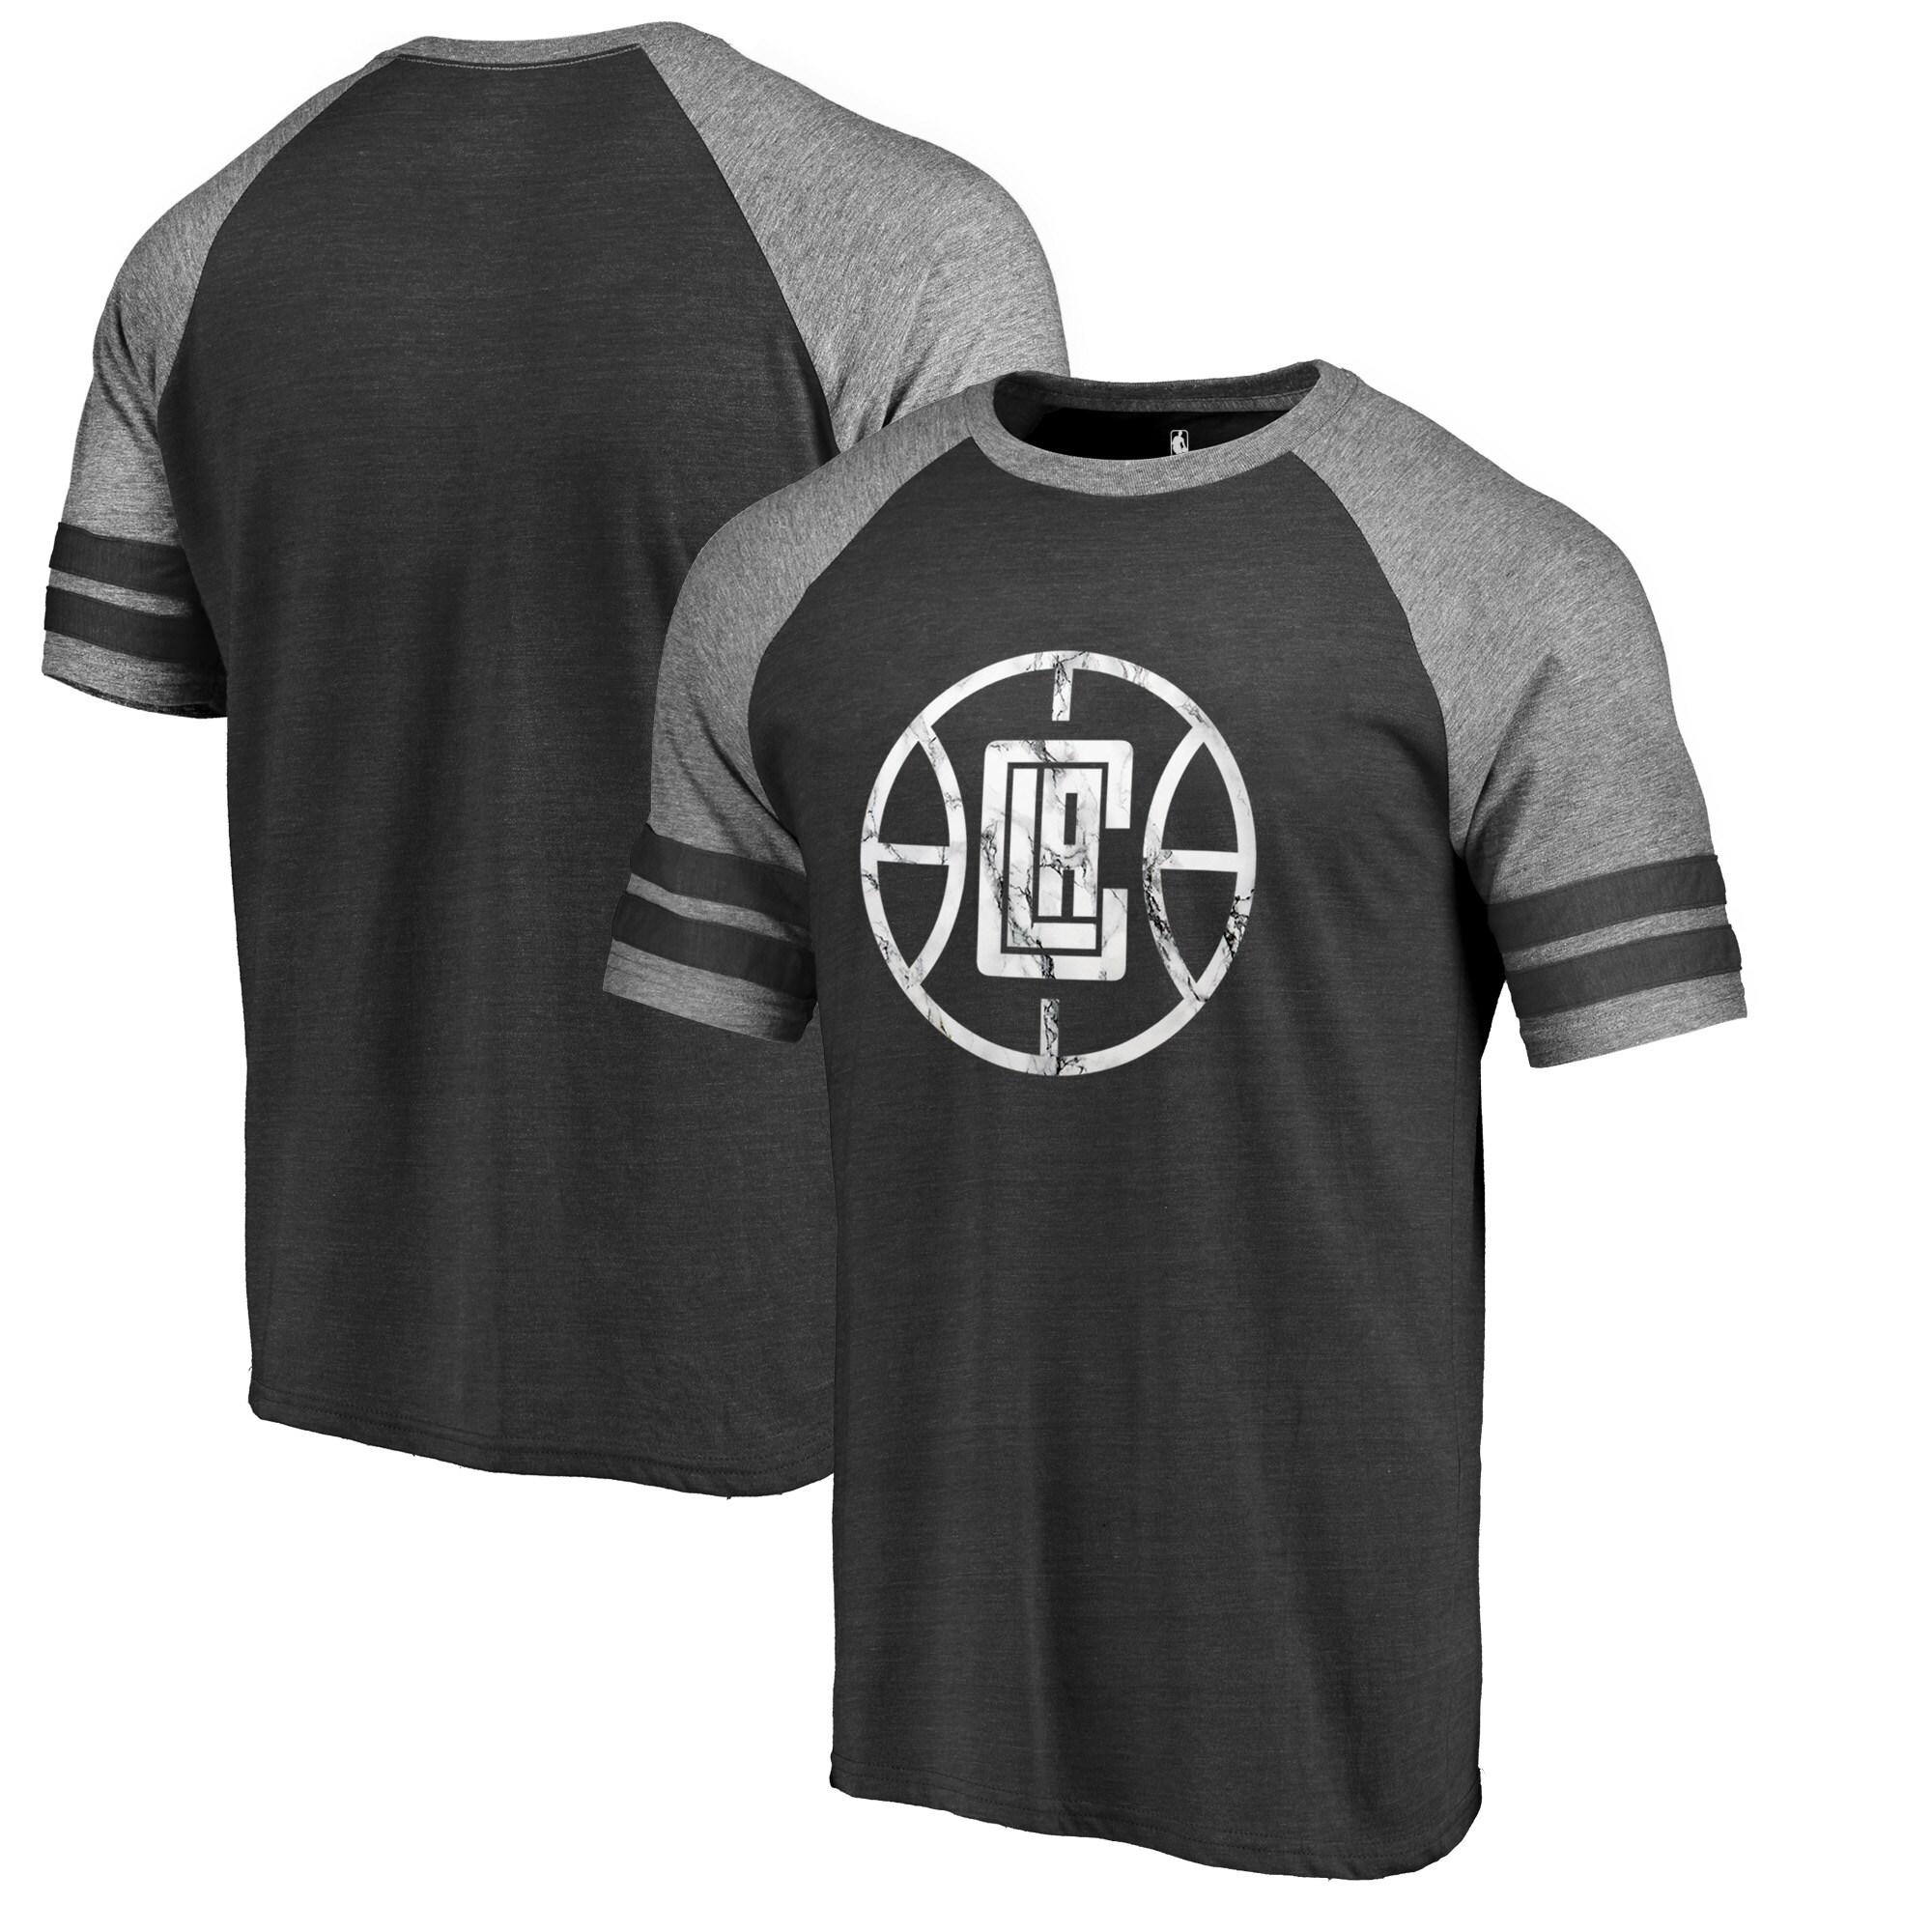 LA Clippers Fanatics Branded Marble Logo Raglan T-Shirt - Black